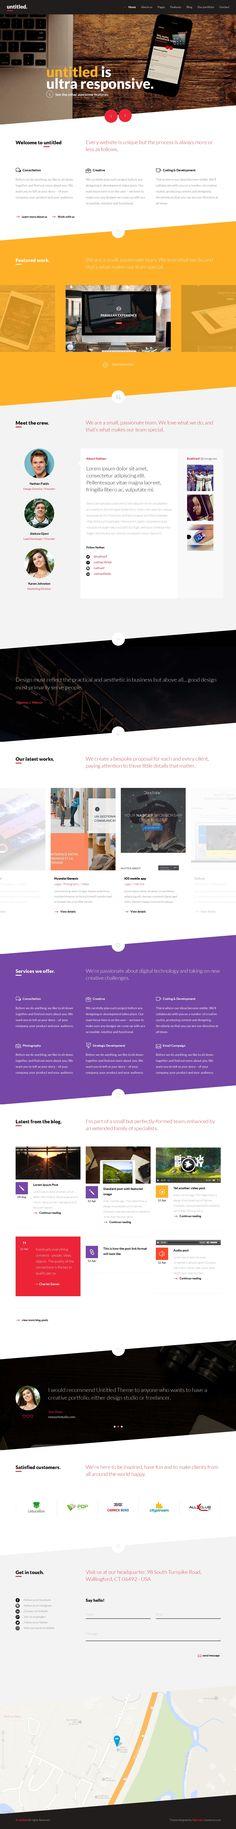 Untitled - Creative Multipurpose WordPress Theme #web #design